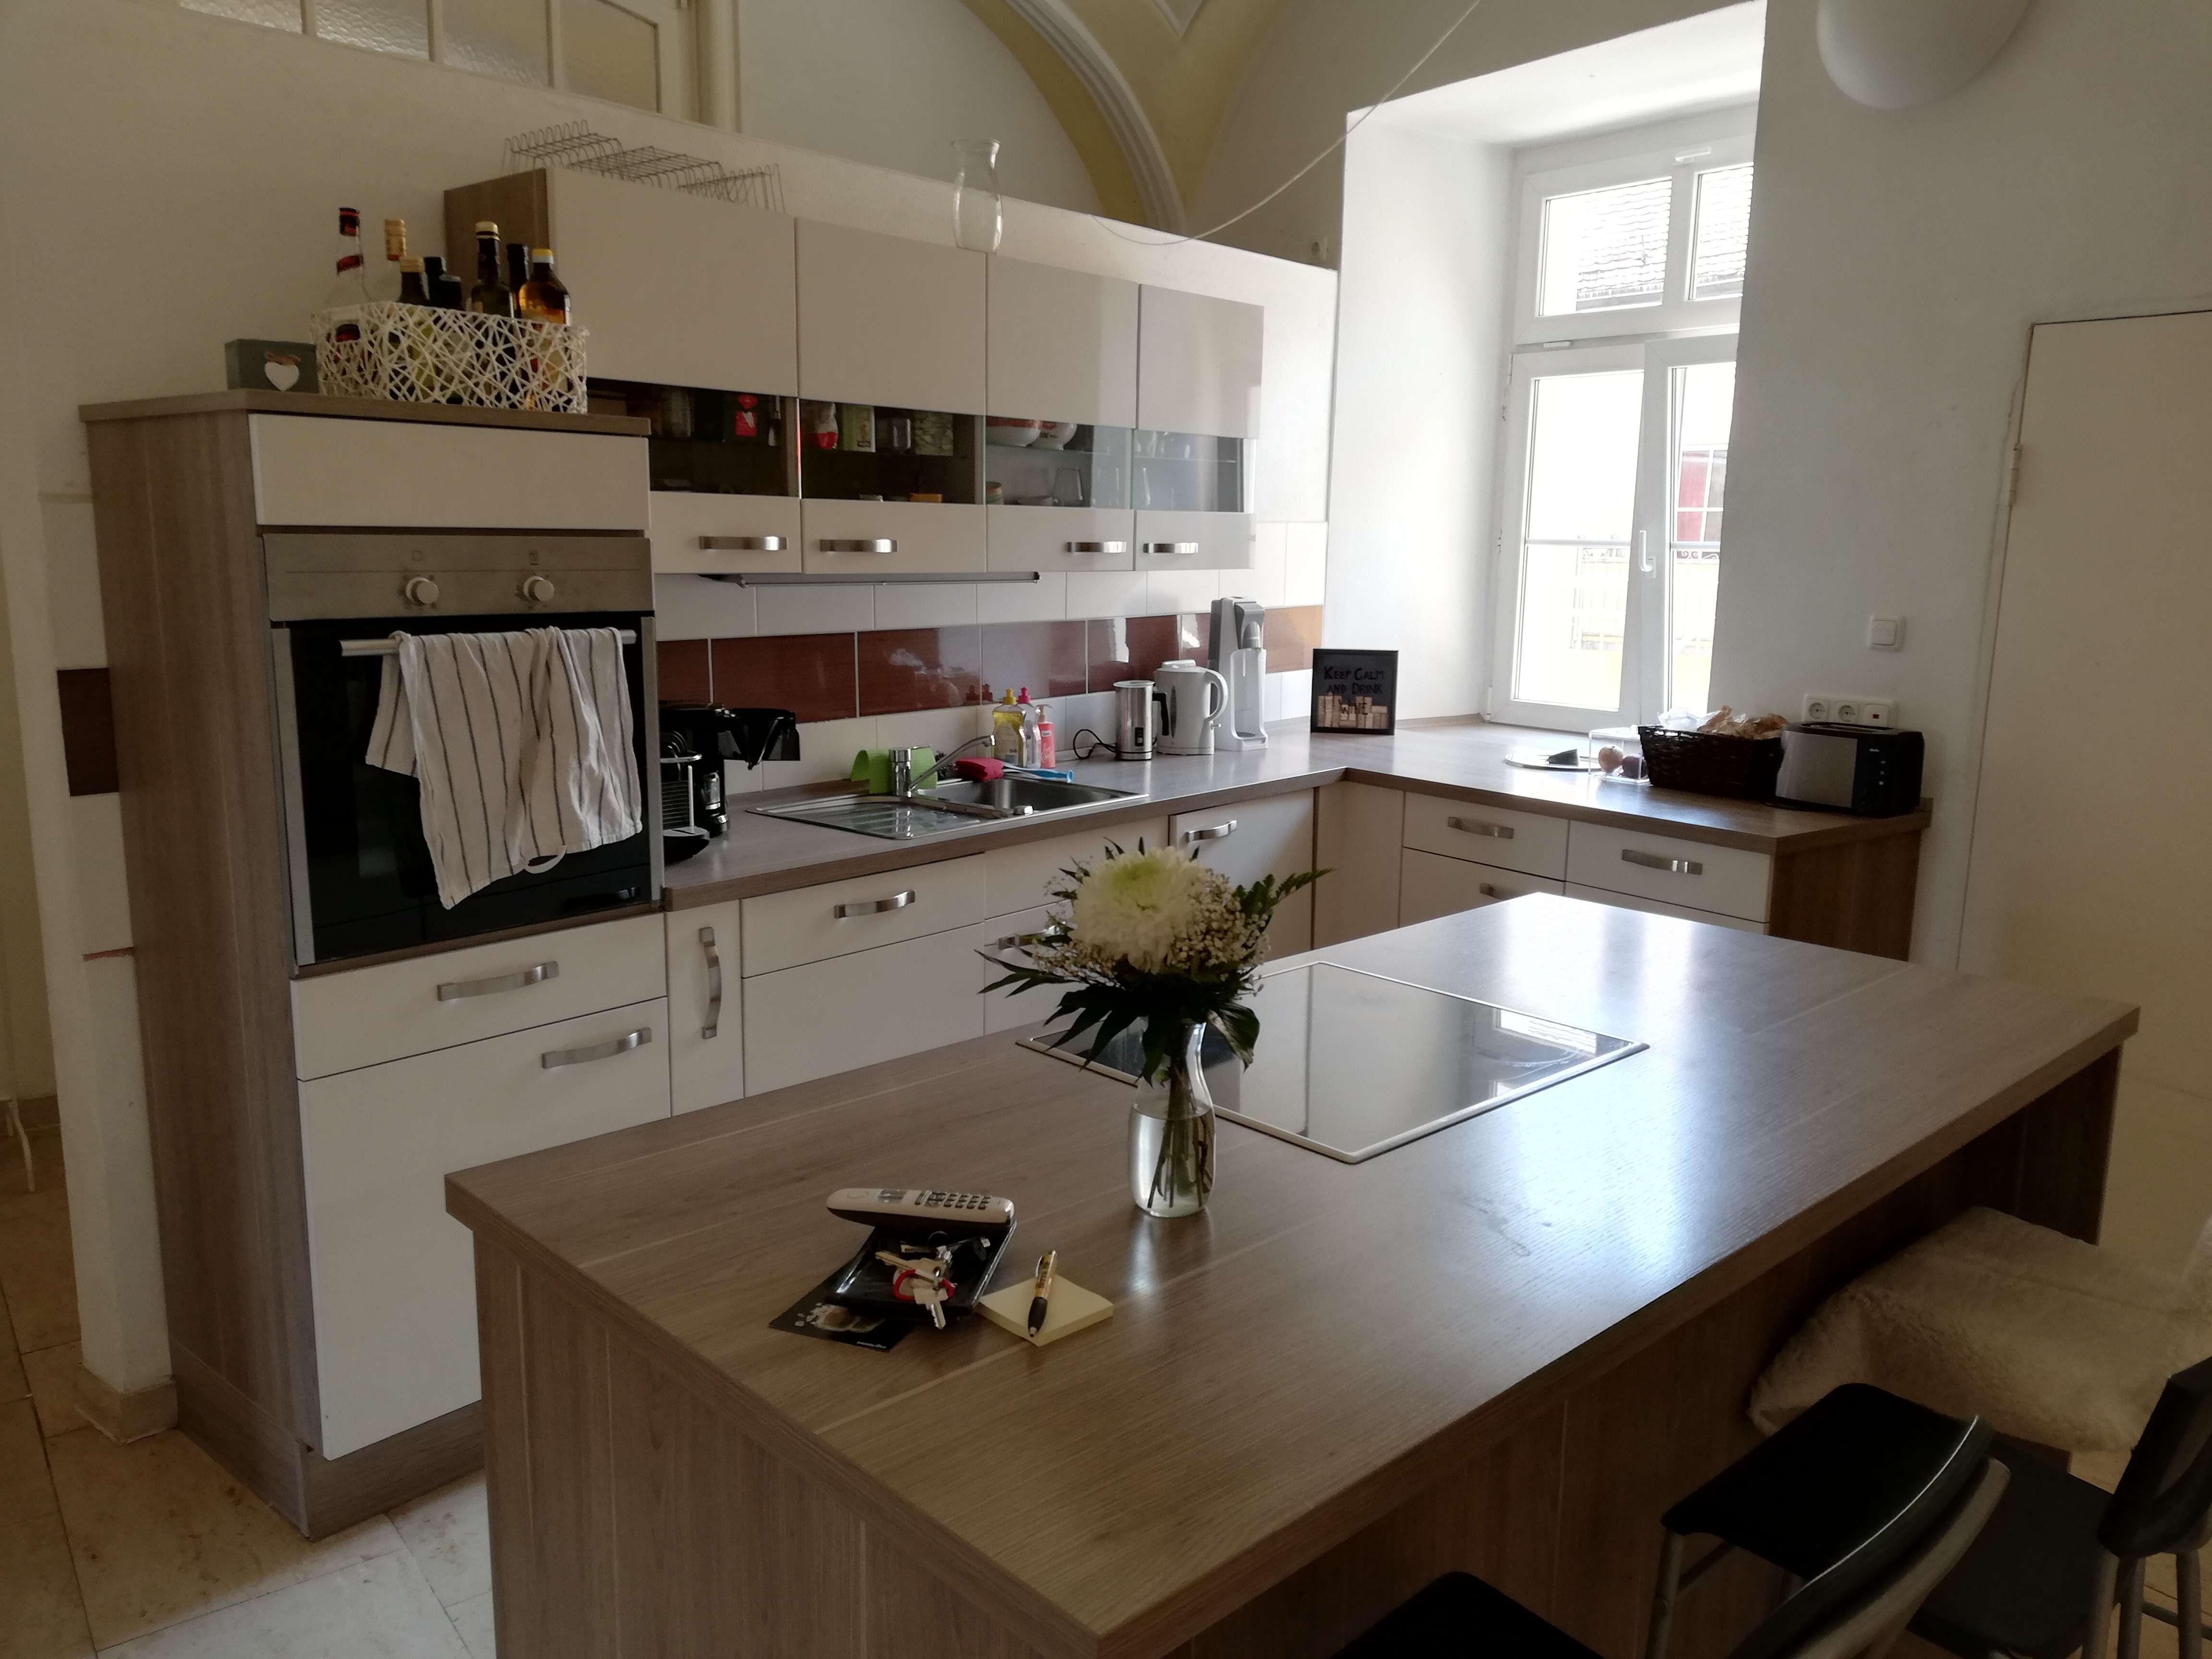 Gepflegte 4-Zimmer-Wohnung in denkmalgeschütztem Rokoko-Palais ab 01.09.2019 zu vermieten